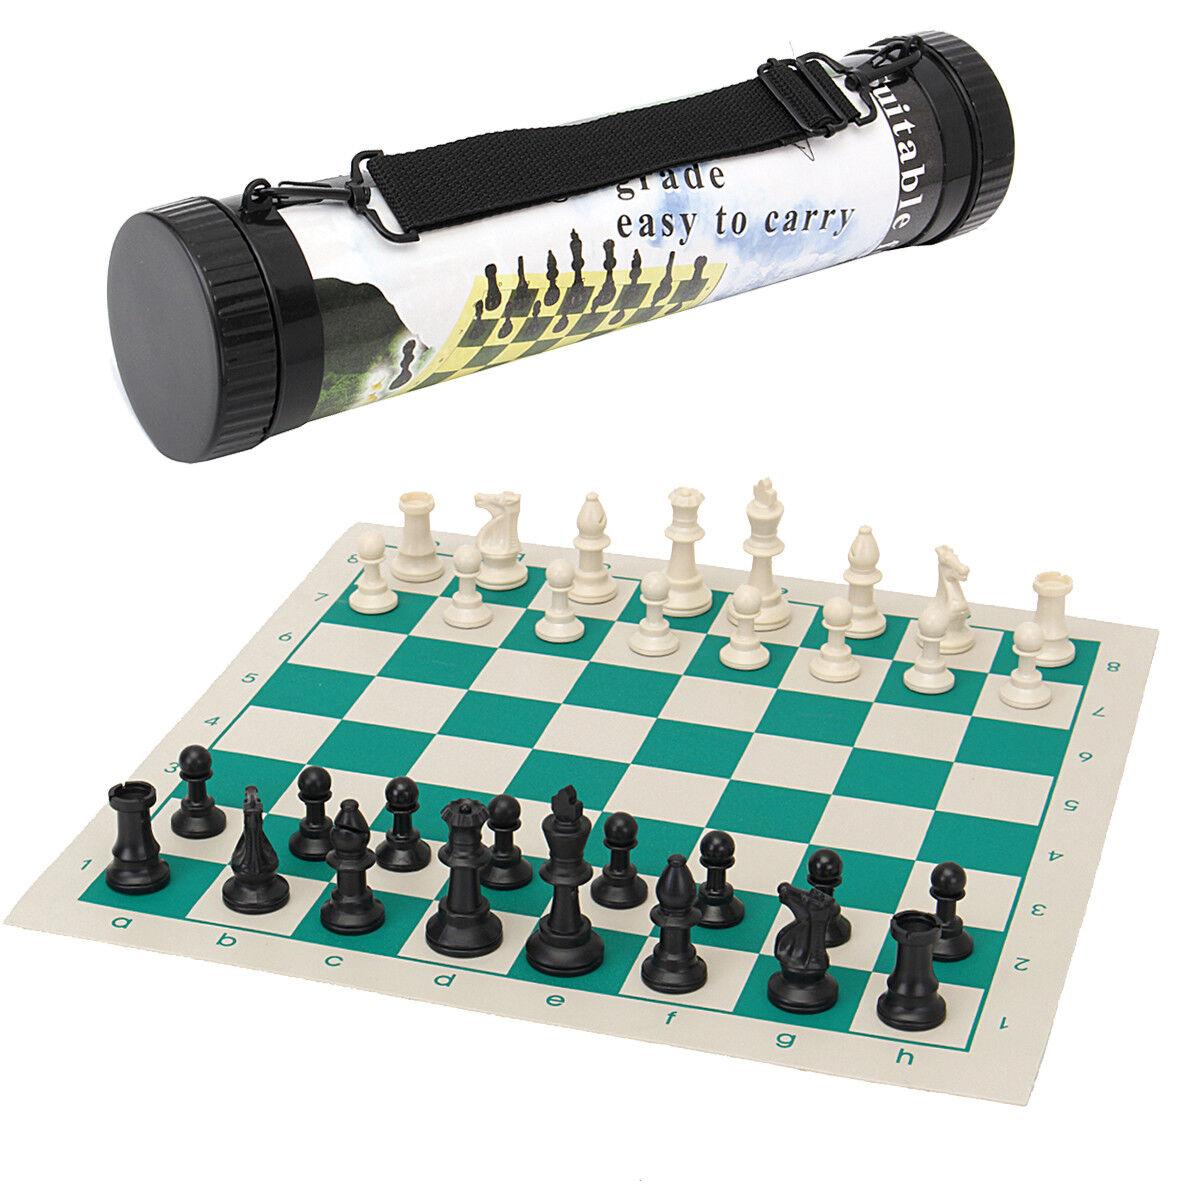 43*43cm Outdoor Travel Tournament Size Chess Game Set Plasti